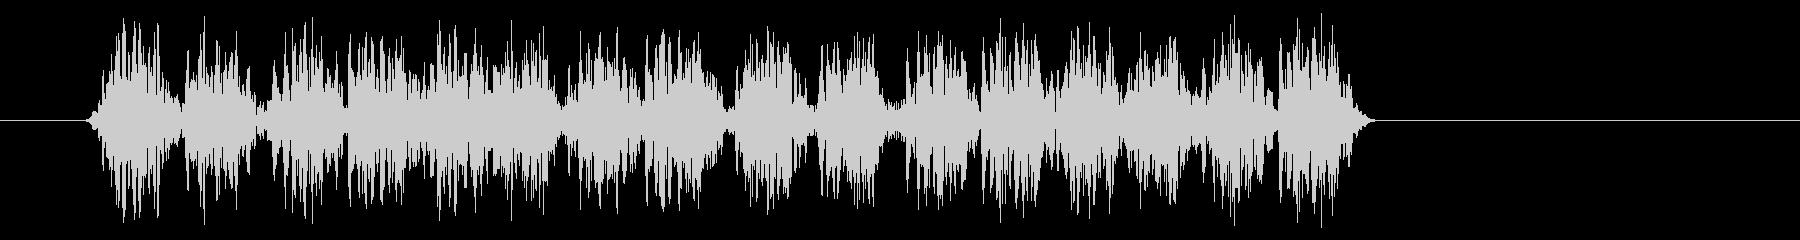 SNES レース02-07(タイヤ スキの未再生の波形